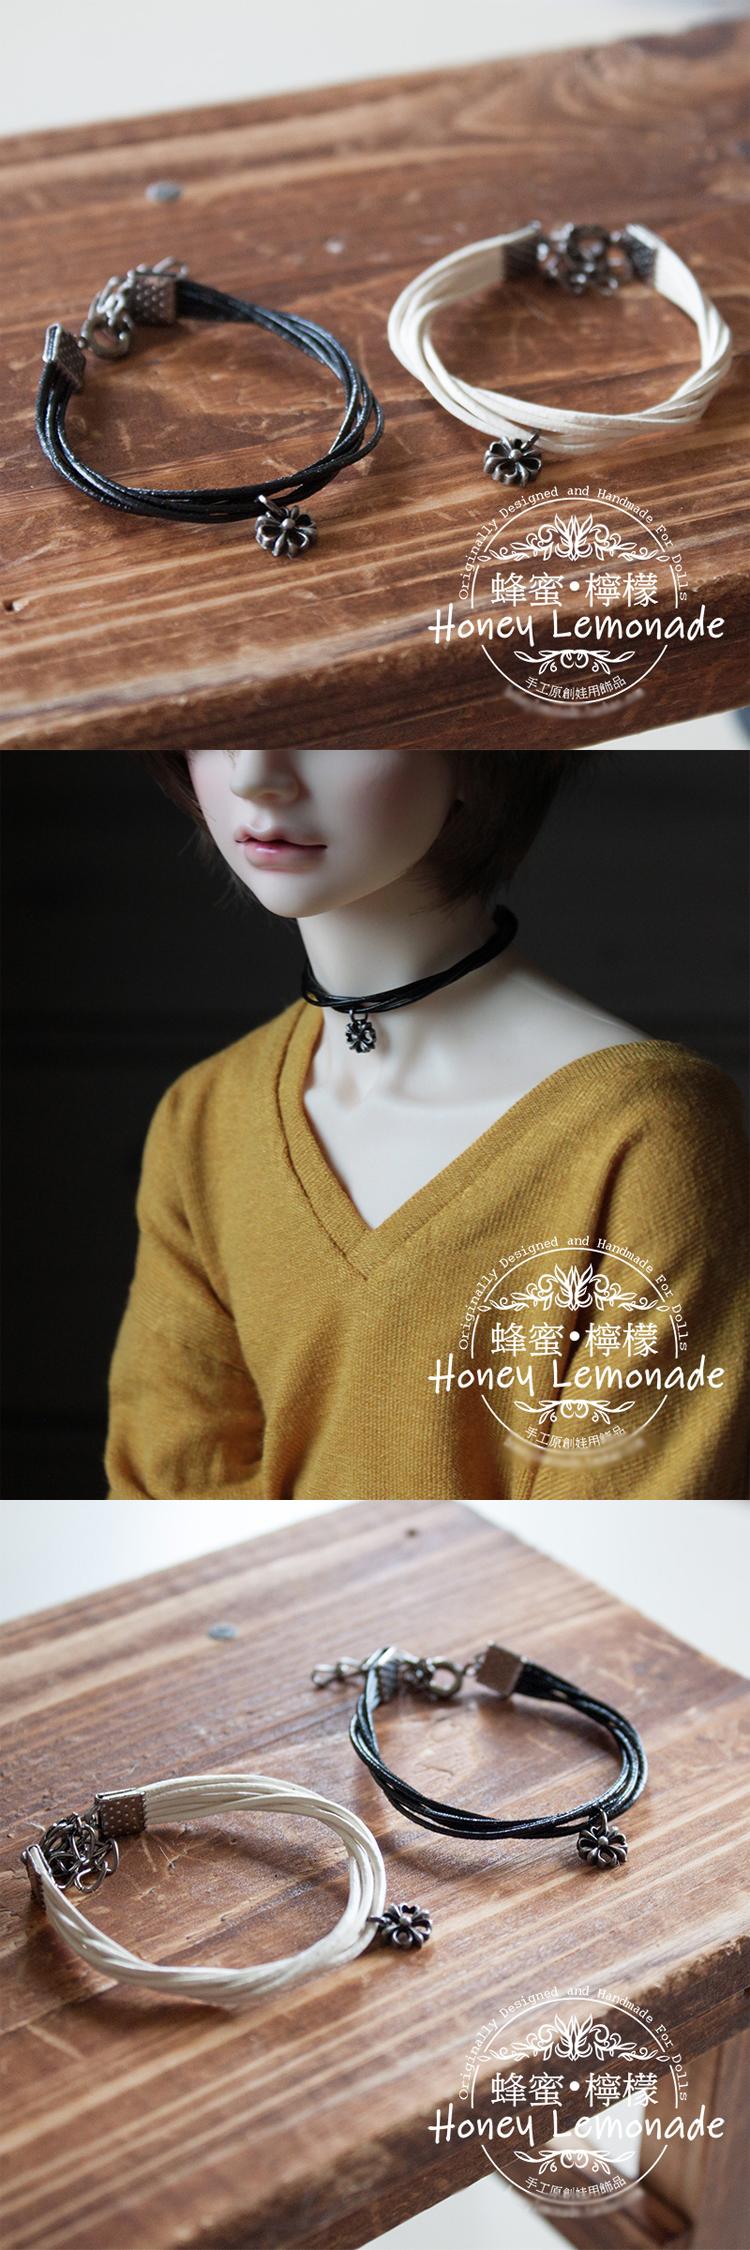 70cm 1/3 Necklace/Choker For 70cm/SD/MSD